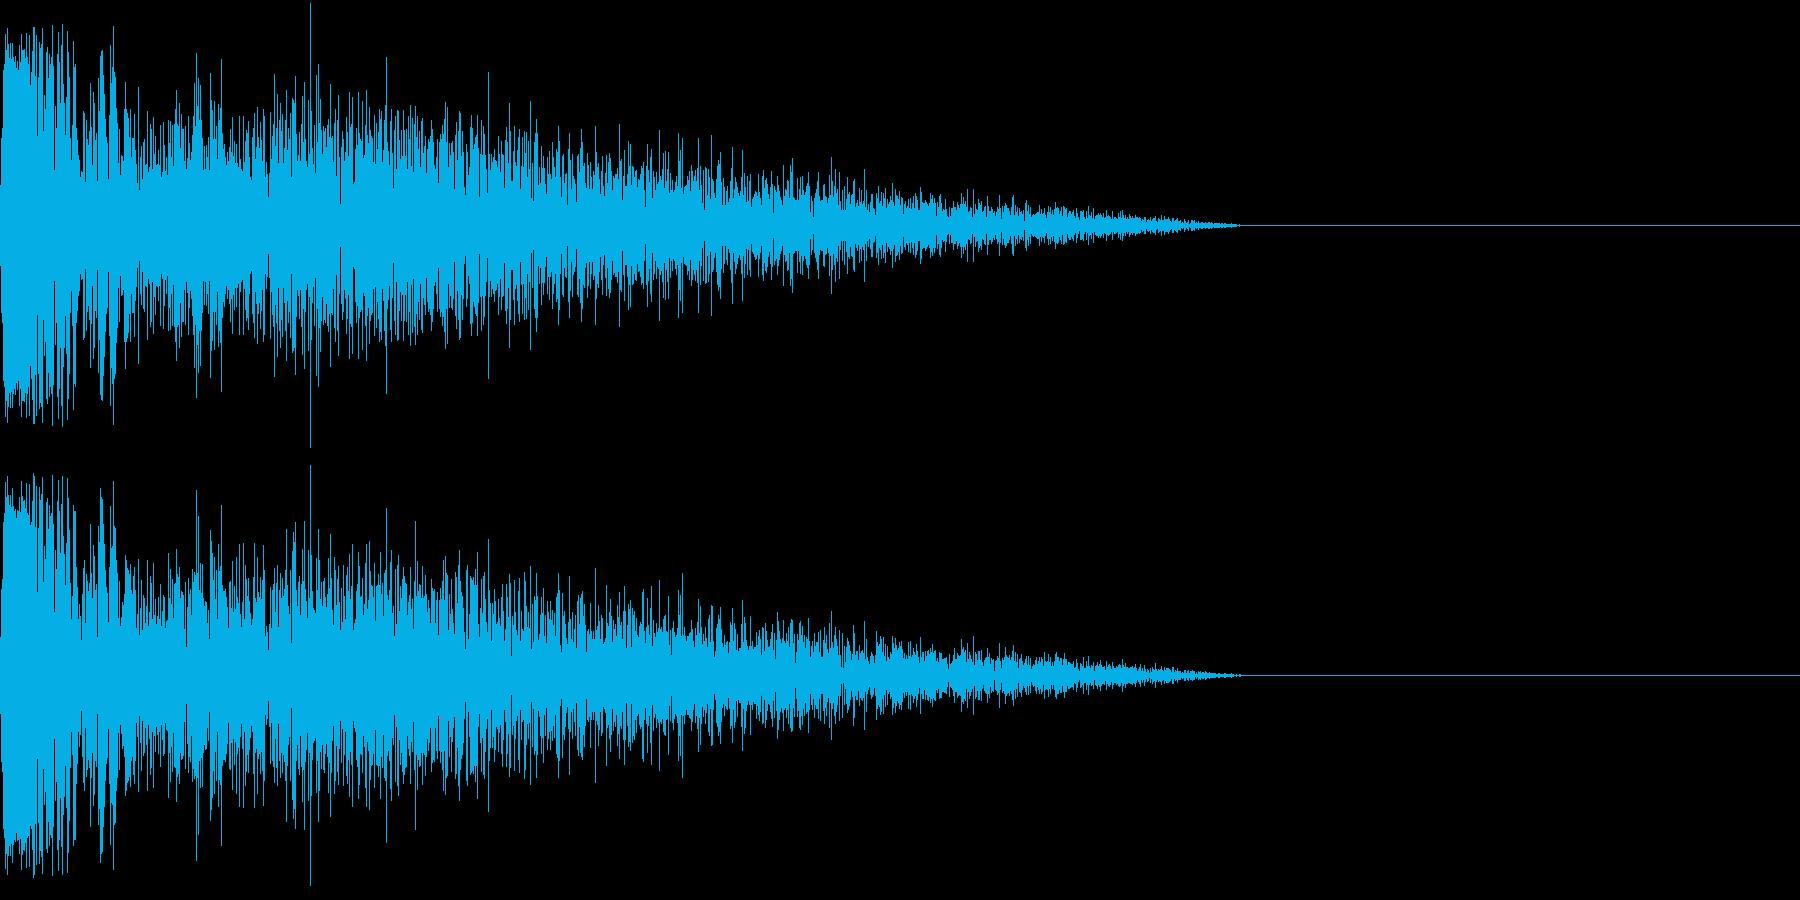 DTM Snare 5 オリジナル音源の再生済みの波形